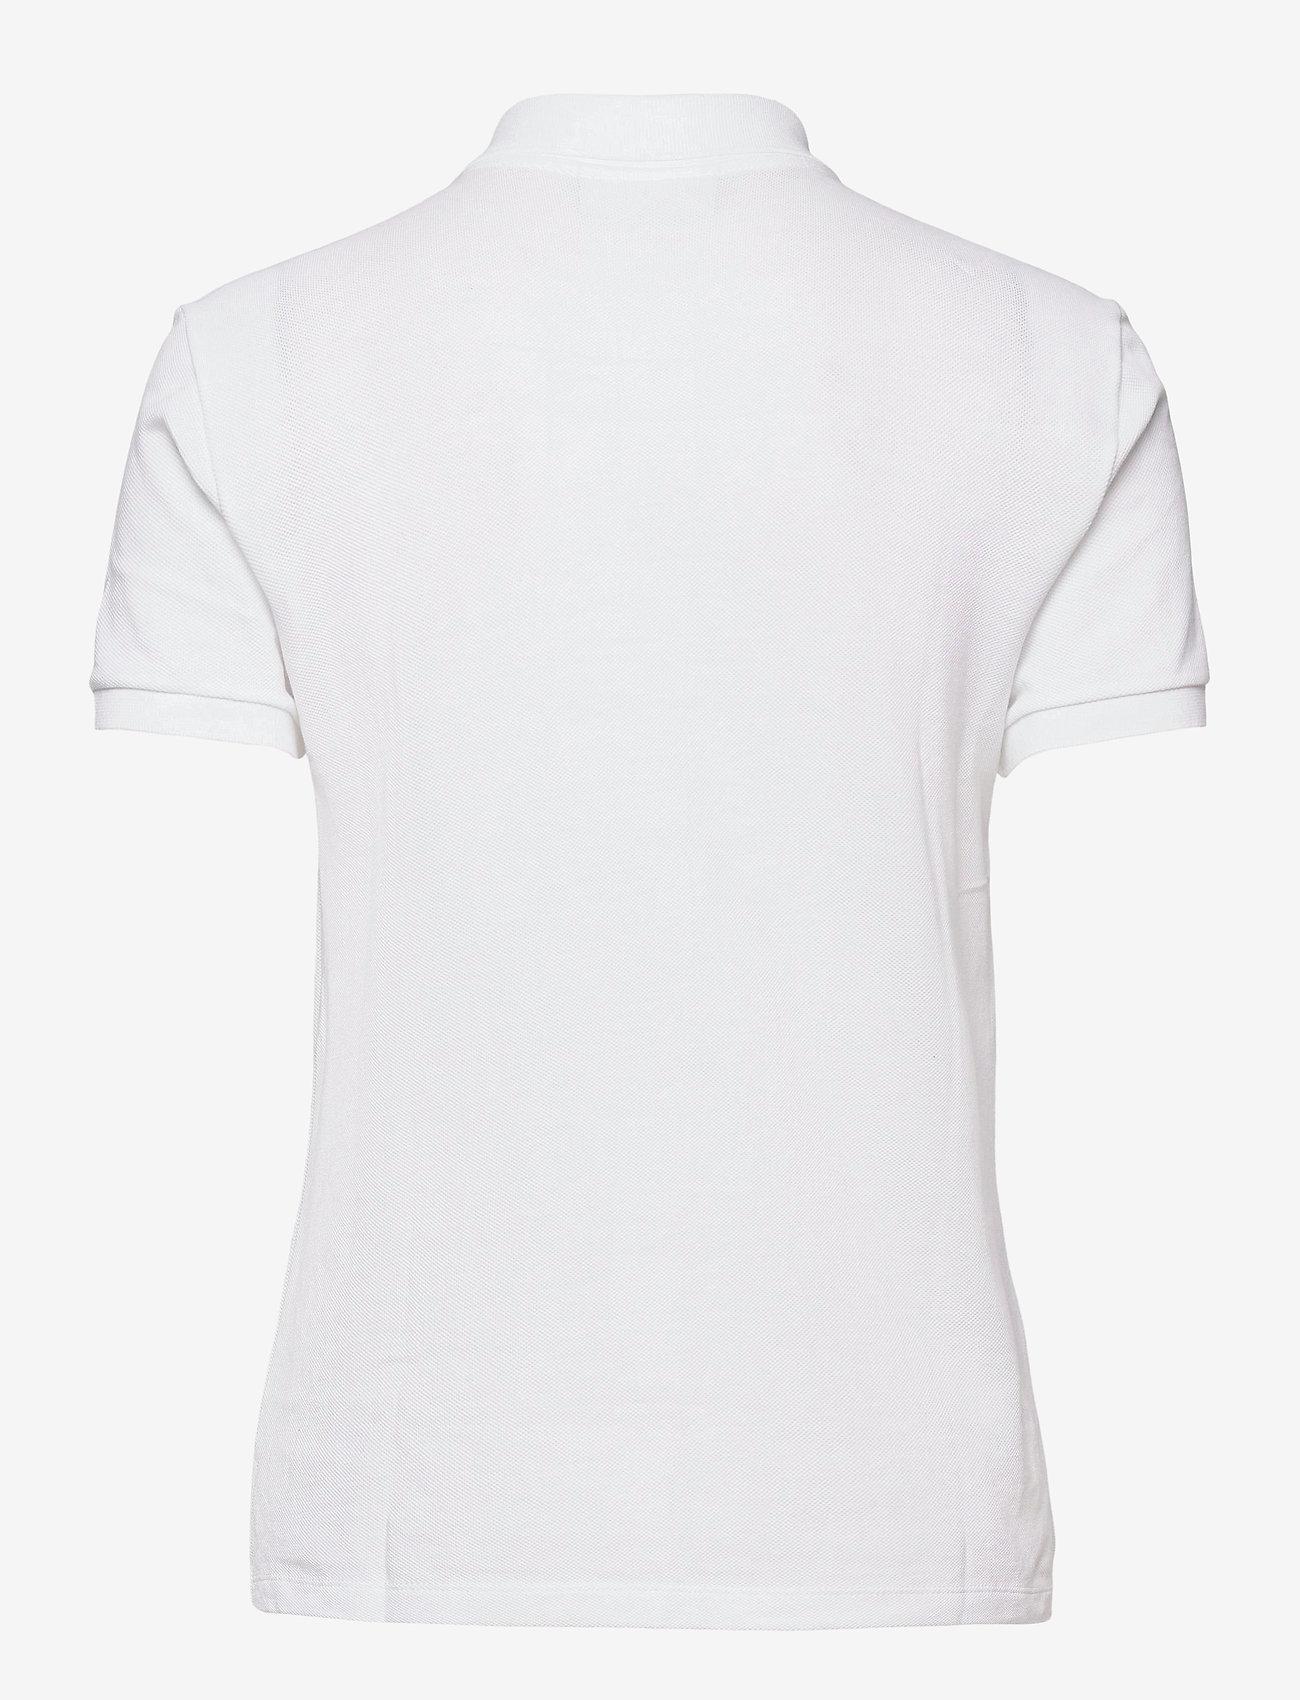 Lacoste - Womens S/S best polo - polohemden - white - 1